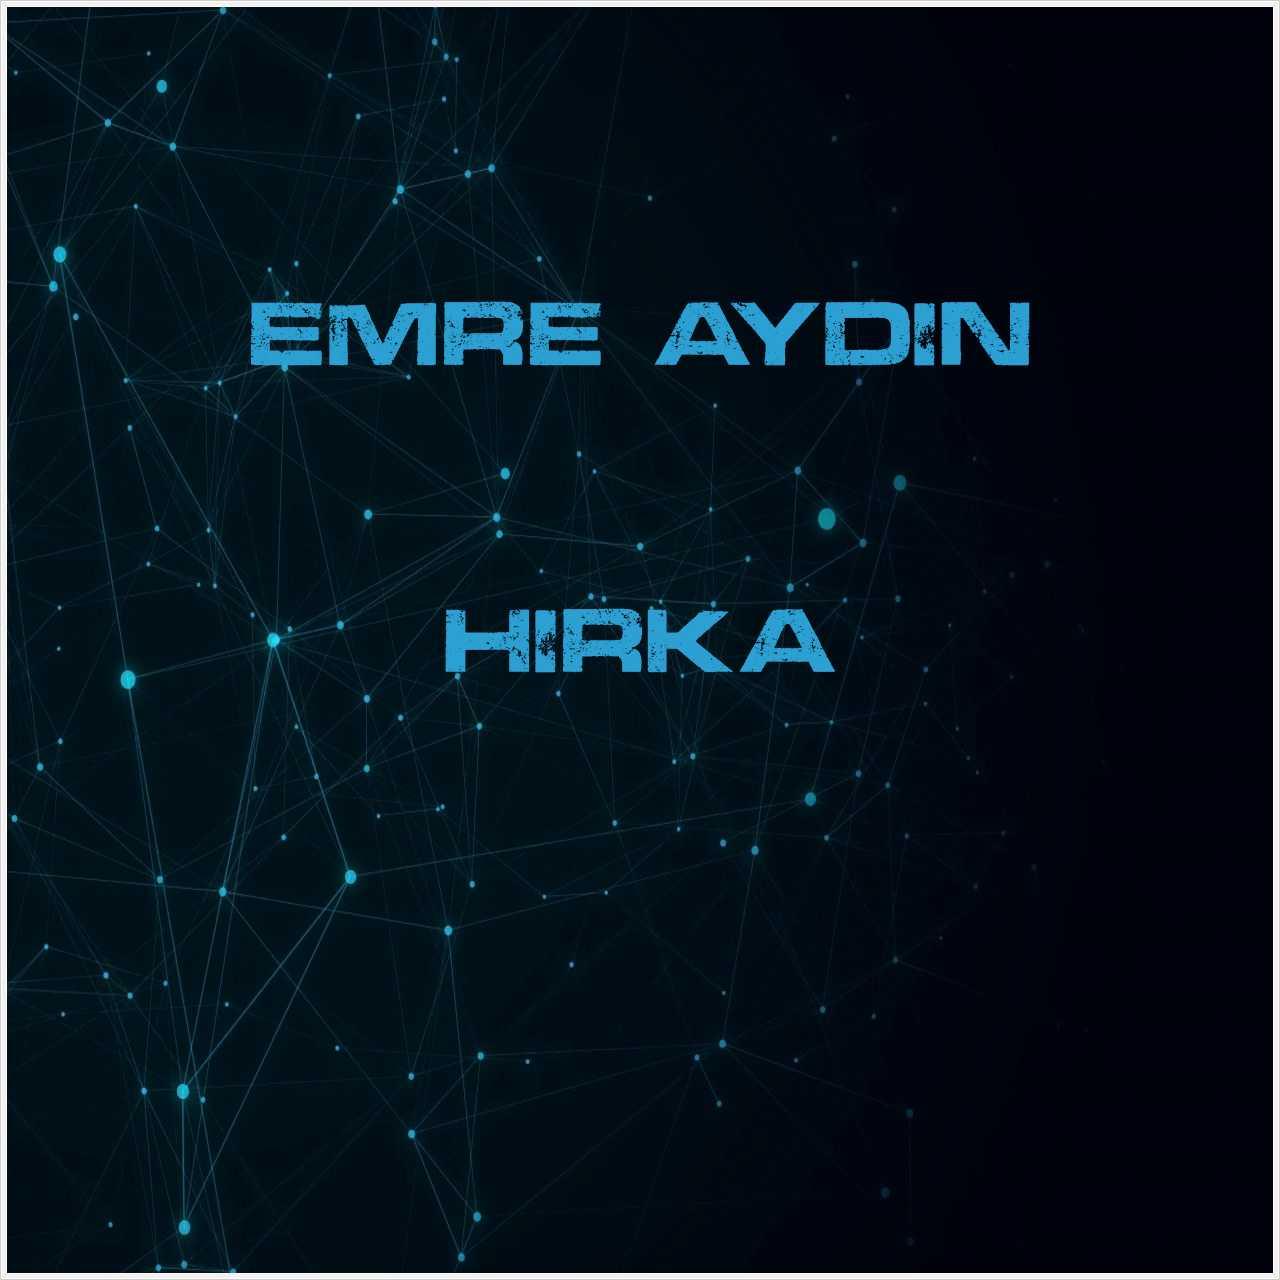 دانلود آهنگ جدید Emre Aydın به نام Hırka